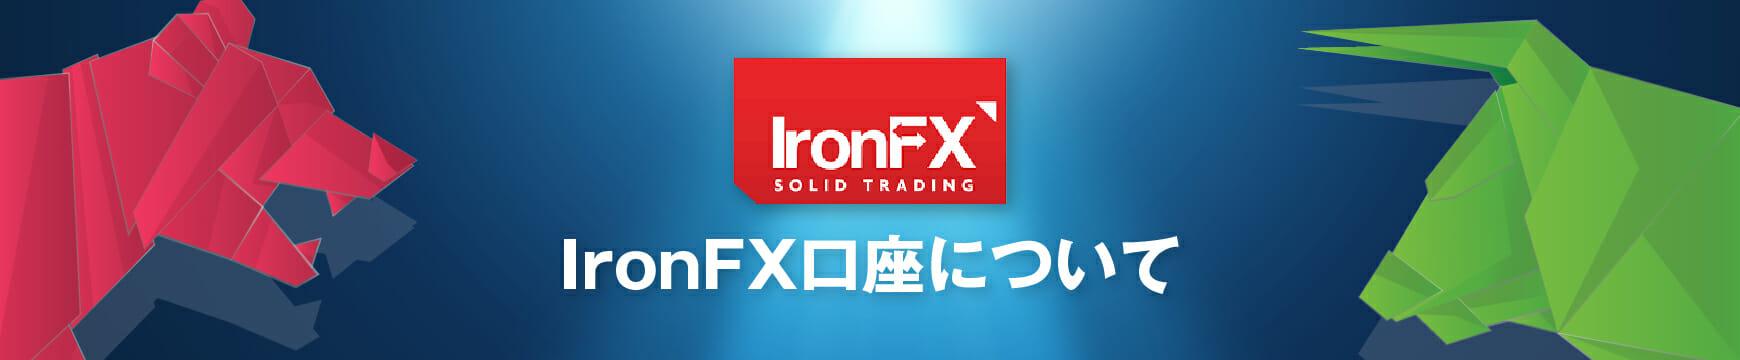 IronFX(アイアンFX)の口座開設はありかなしか?日本語で徹底解説!